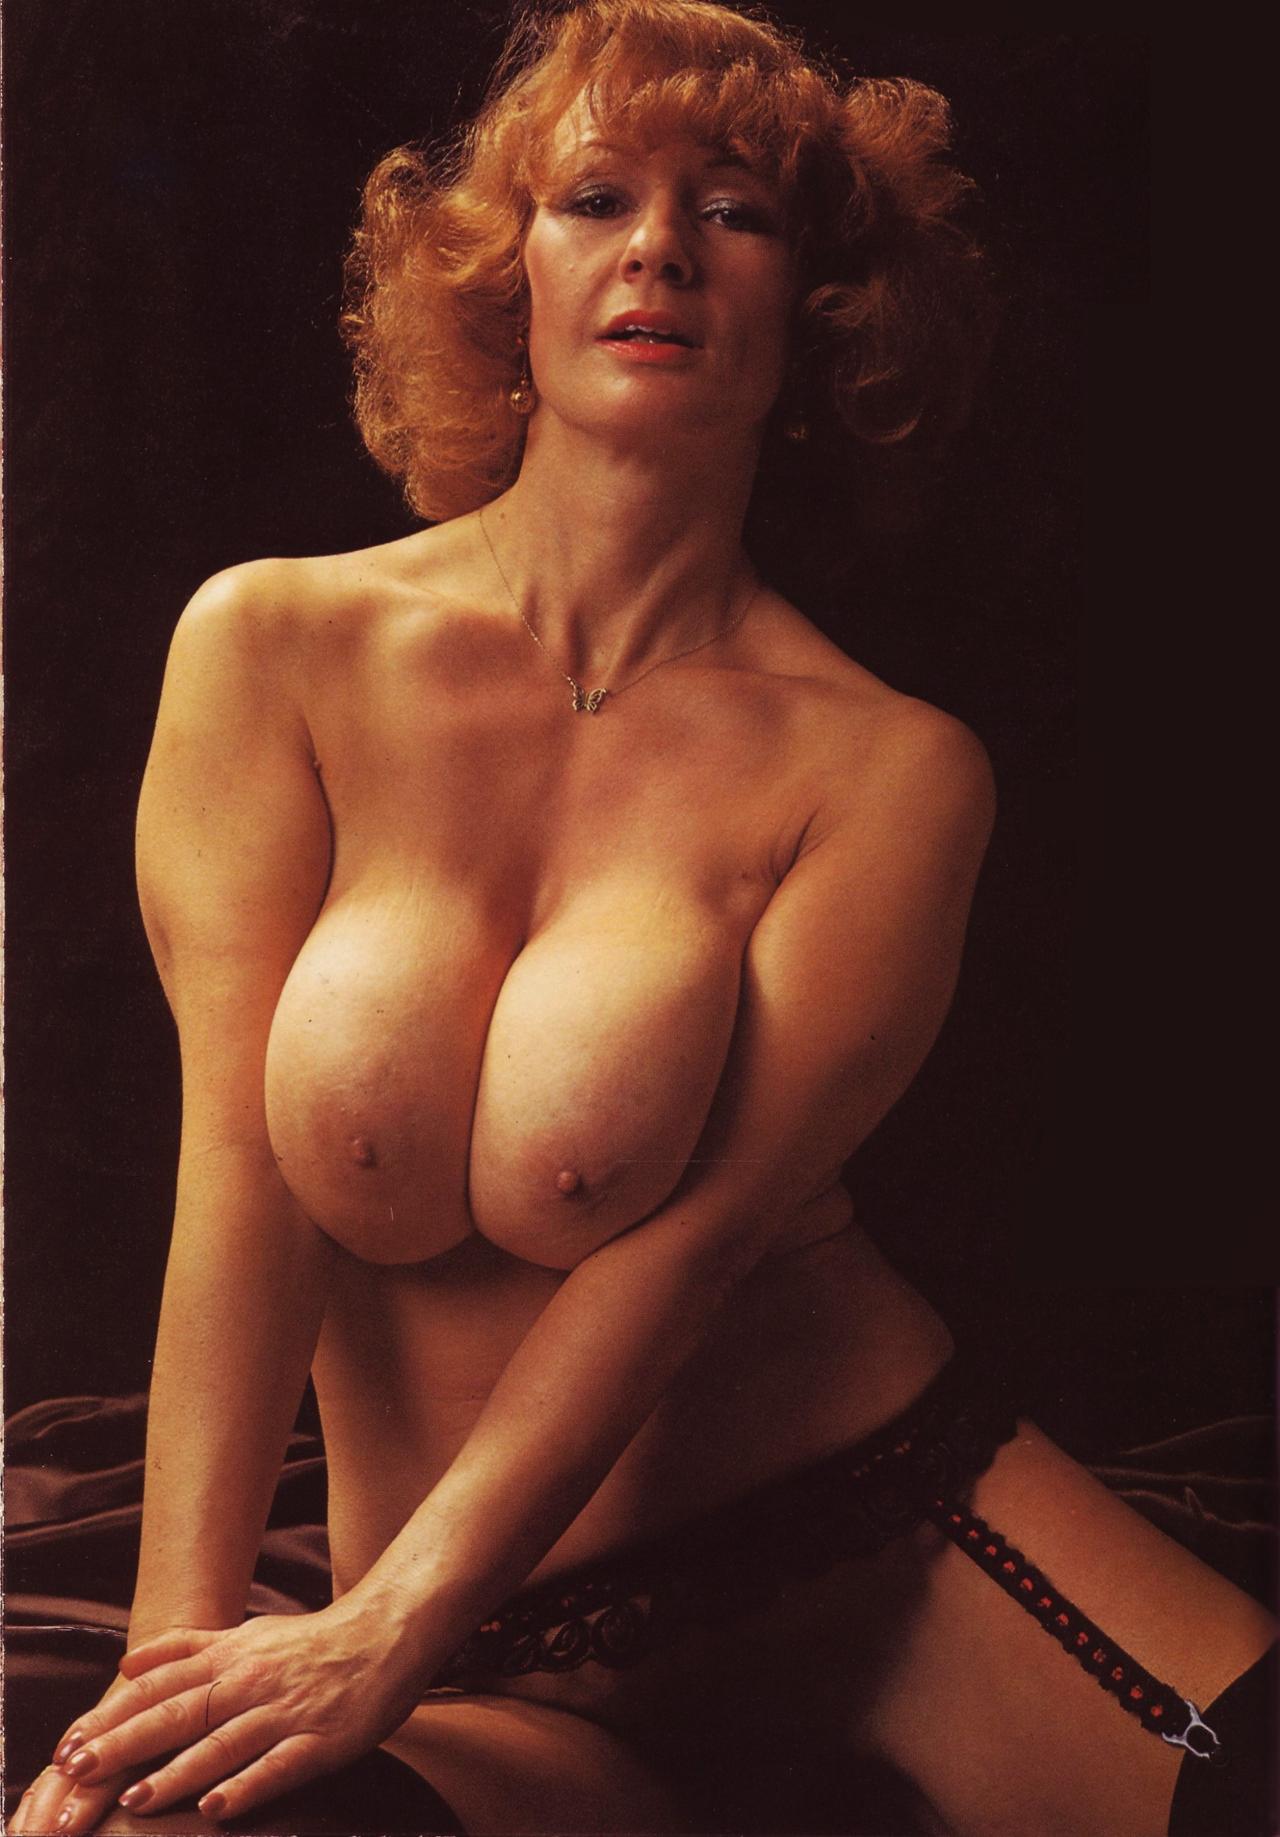 Pat Wynn: 1980s Legendary British Milf. | Milf and Mature ...